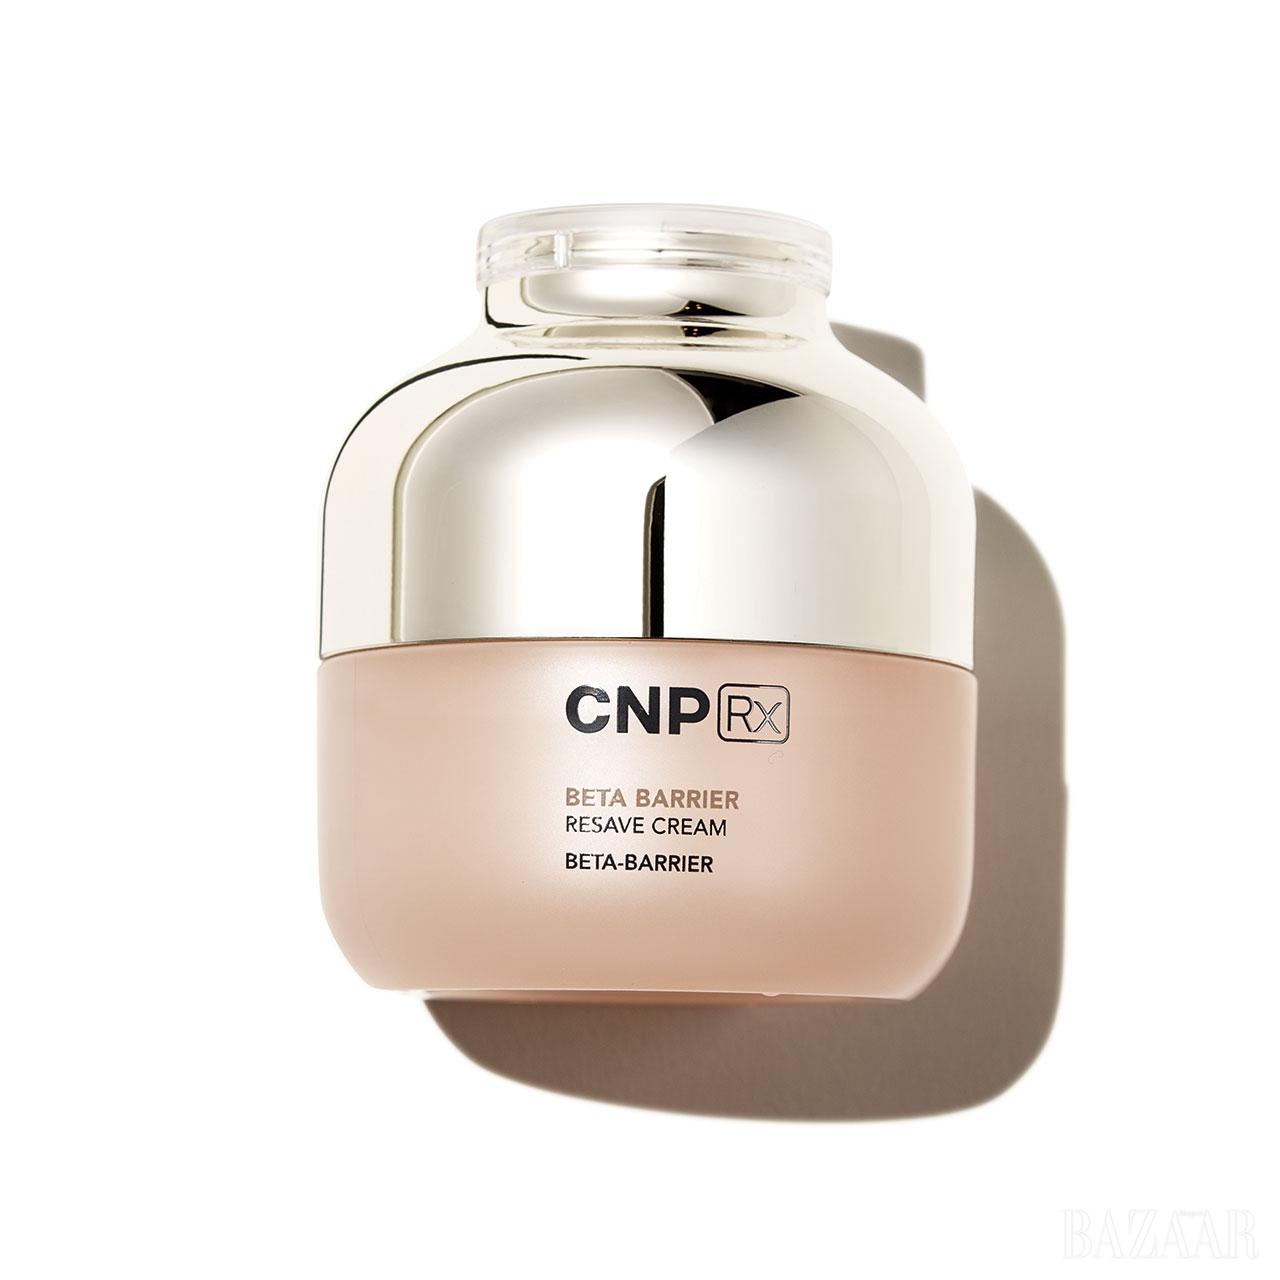 Cnp Rx 베타 베리어 리세이브 크림 세라마이드, 콜레스테롤, 자유지방산이 3:1:1 비율로 섞여 보습 효과가 뛰어나다. 9만원.